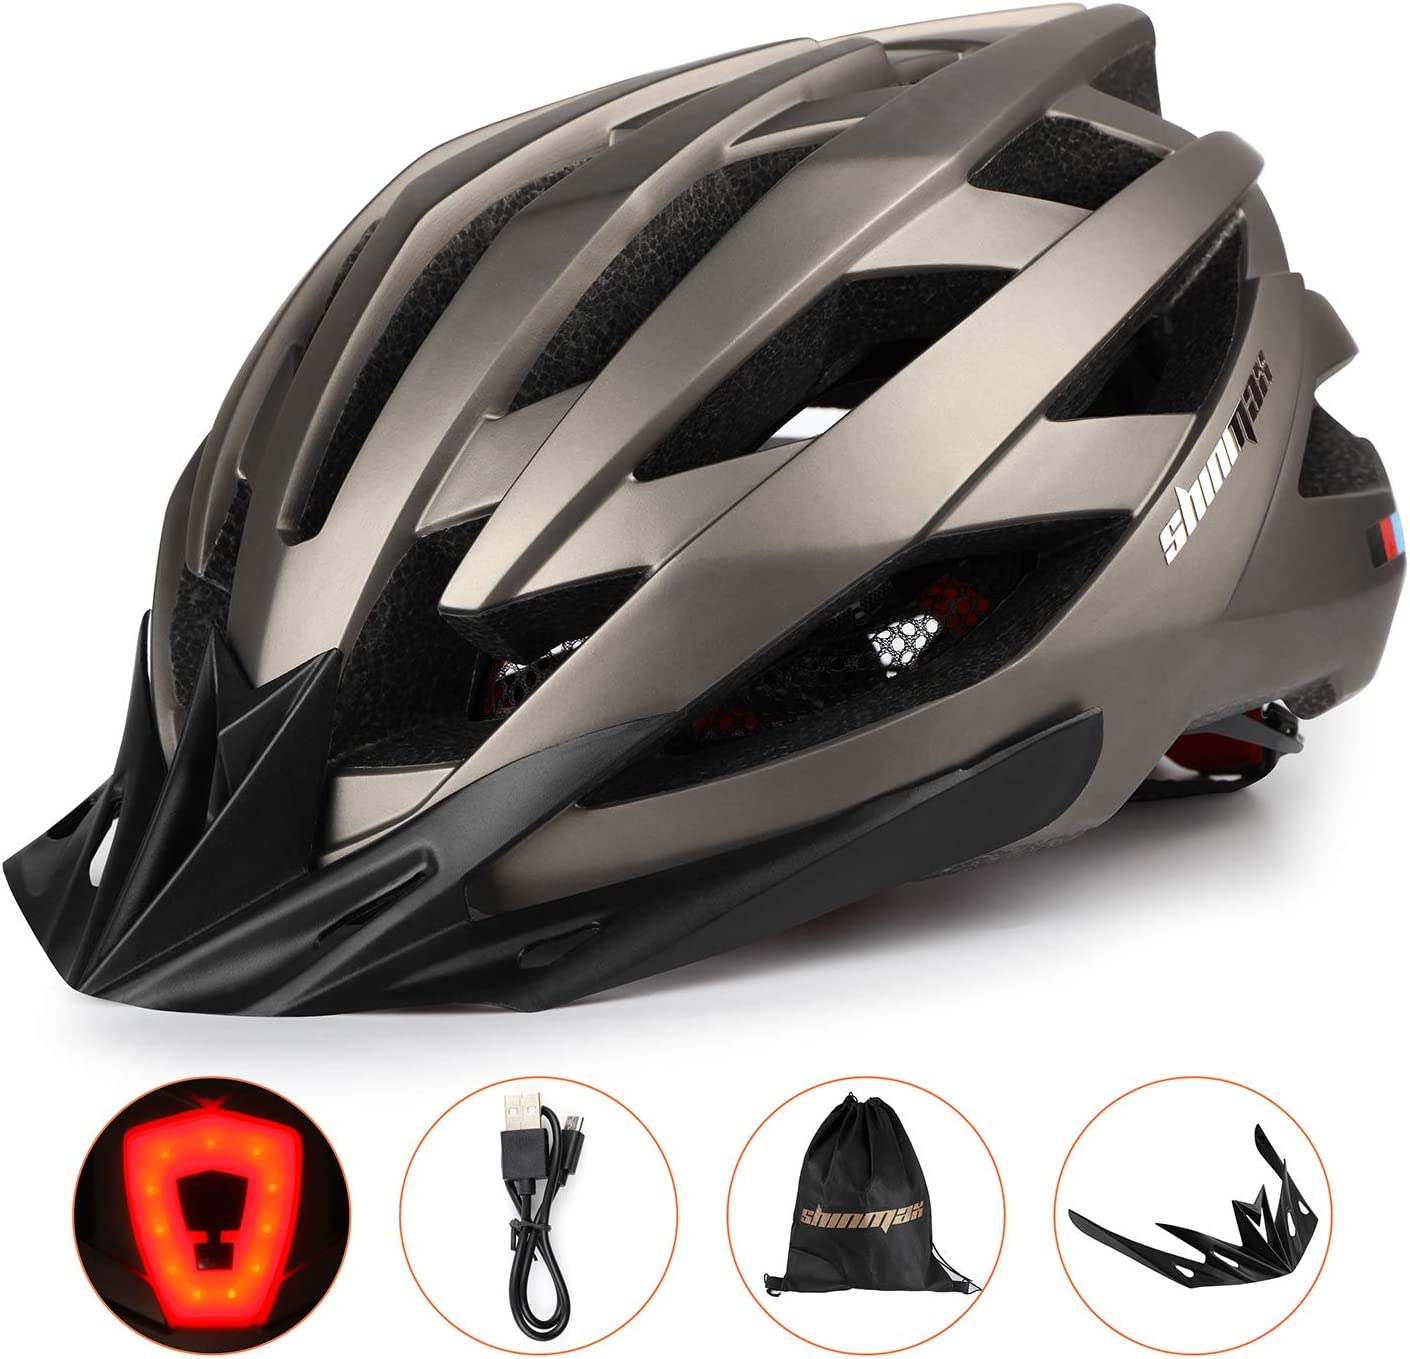 casco de bicicleta unisex con certificado CE para ciclismo al aire libre seguridad deportiva KINGLEAD Casco de bicicleta con luz de seguridad y visera de protecci/ón